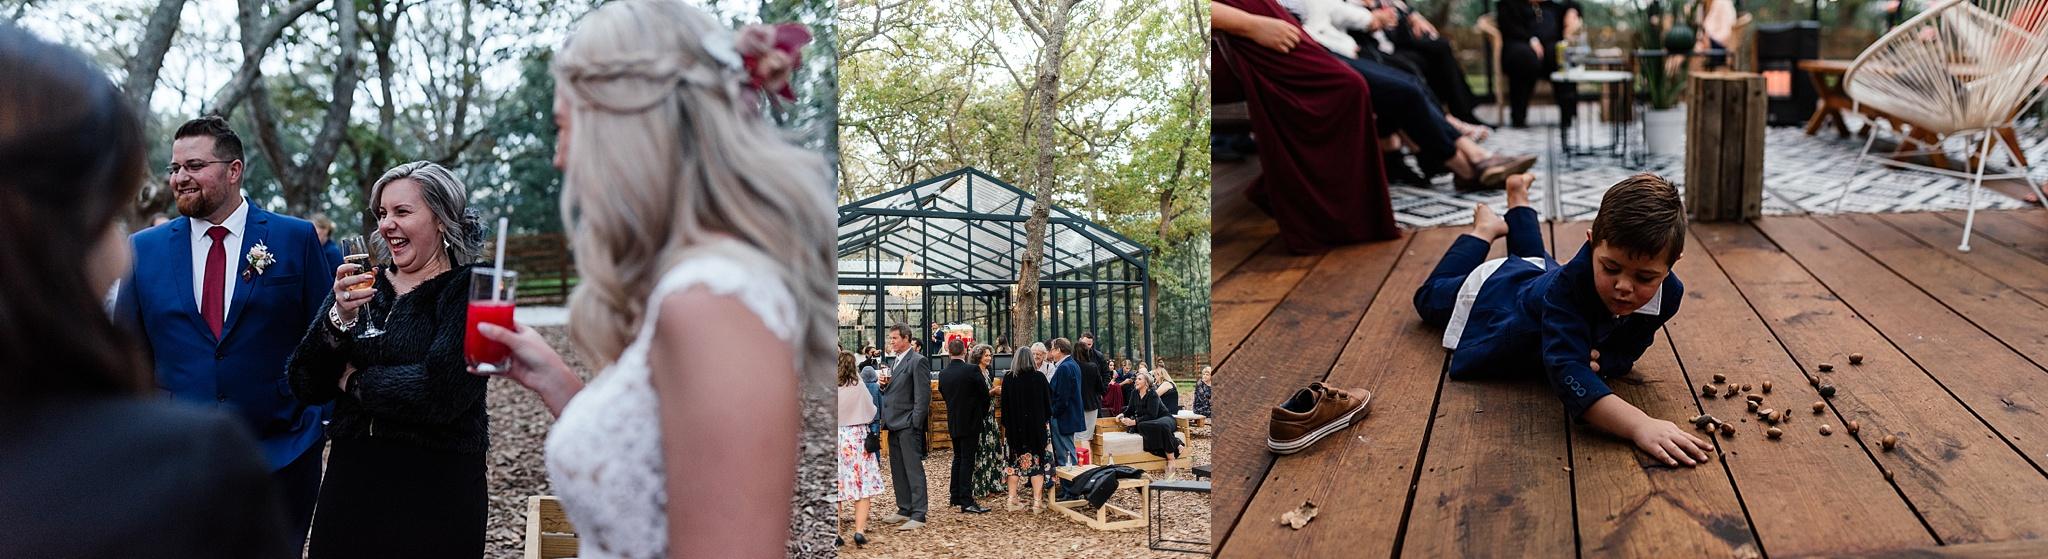 Cape Town Photographer Darren Bester - Die Woud Wedding - Gareth & Roxanne_0070.jpg